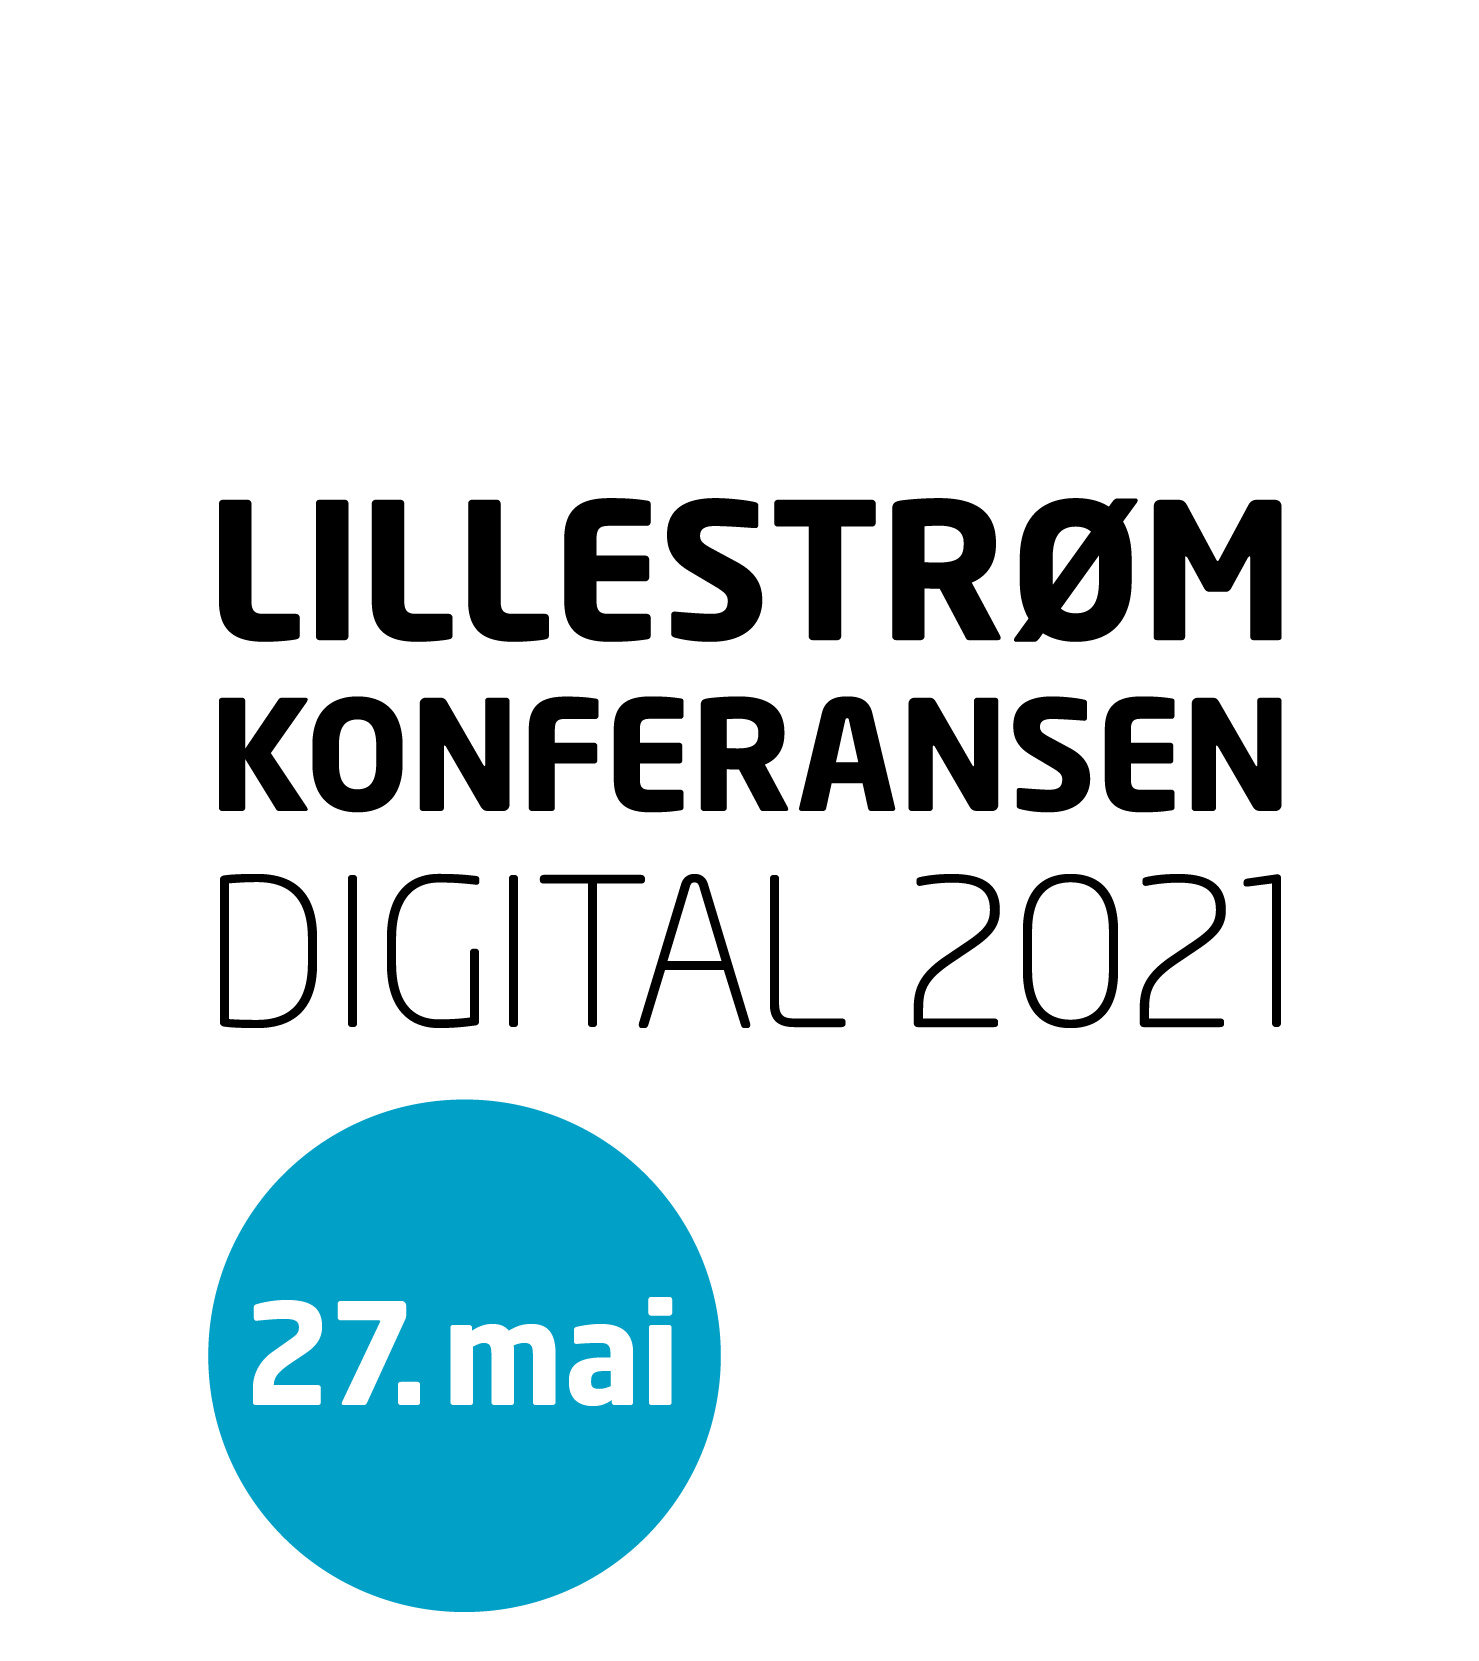 Lillestrømkonferansen 2021 digital